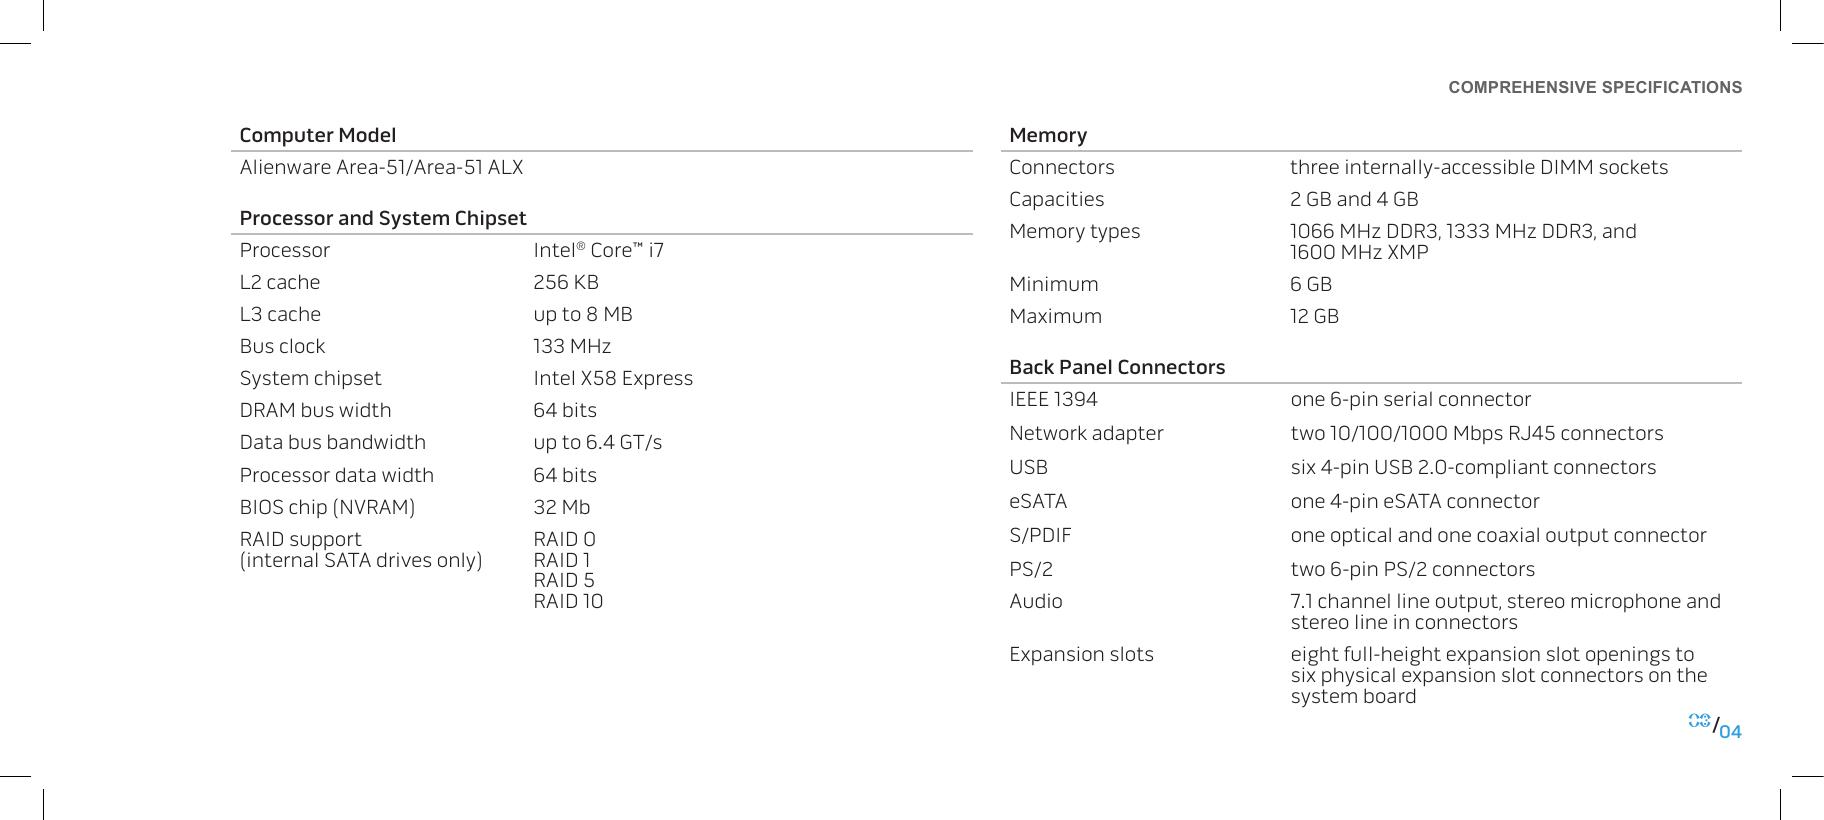 Dell Alienware area51 Area 51 Comprehensive Specifications